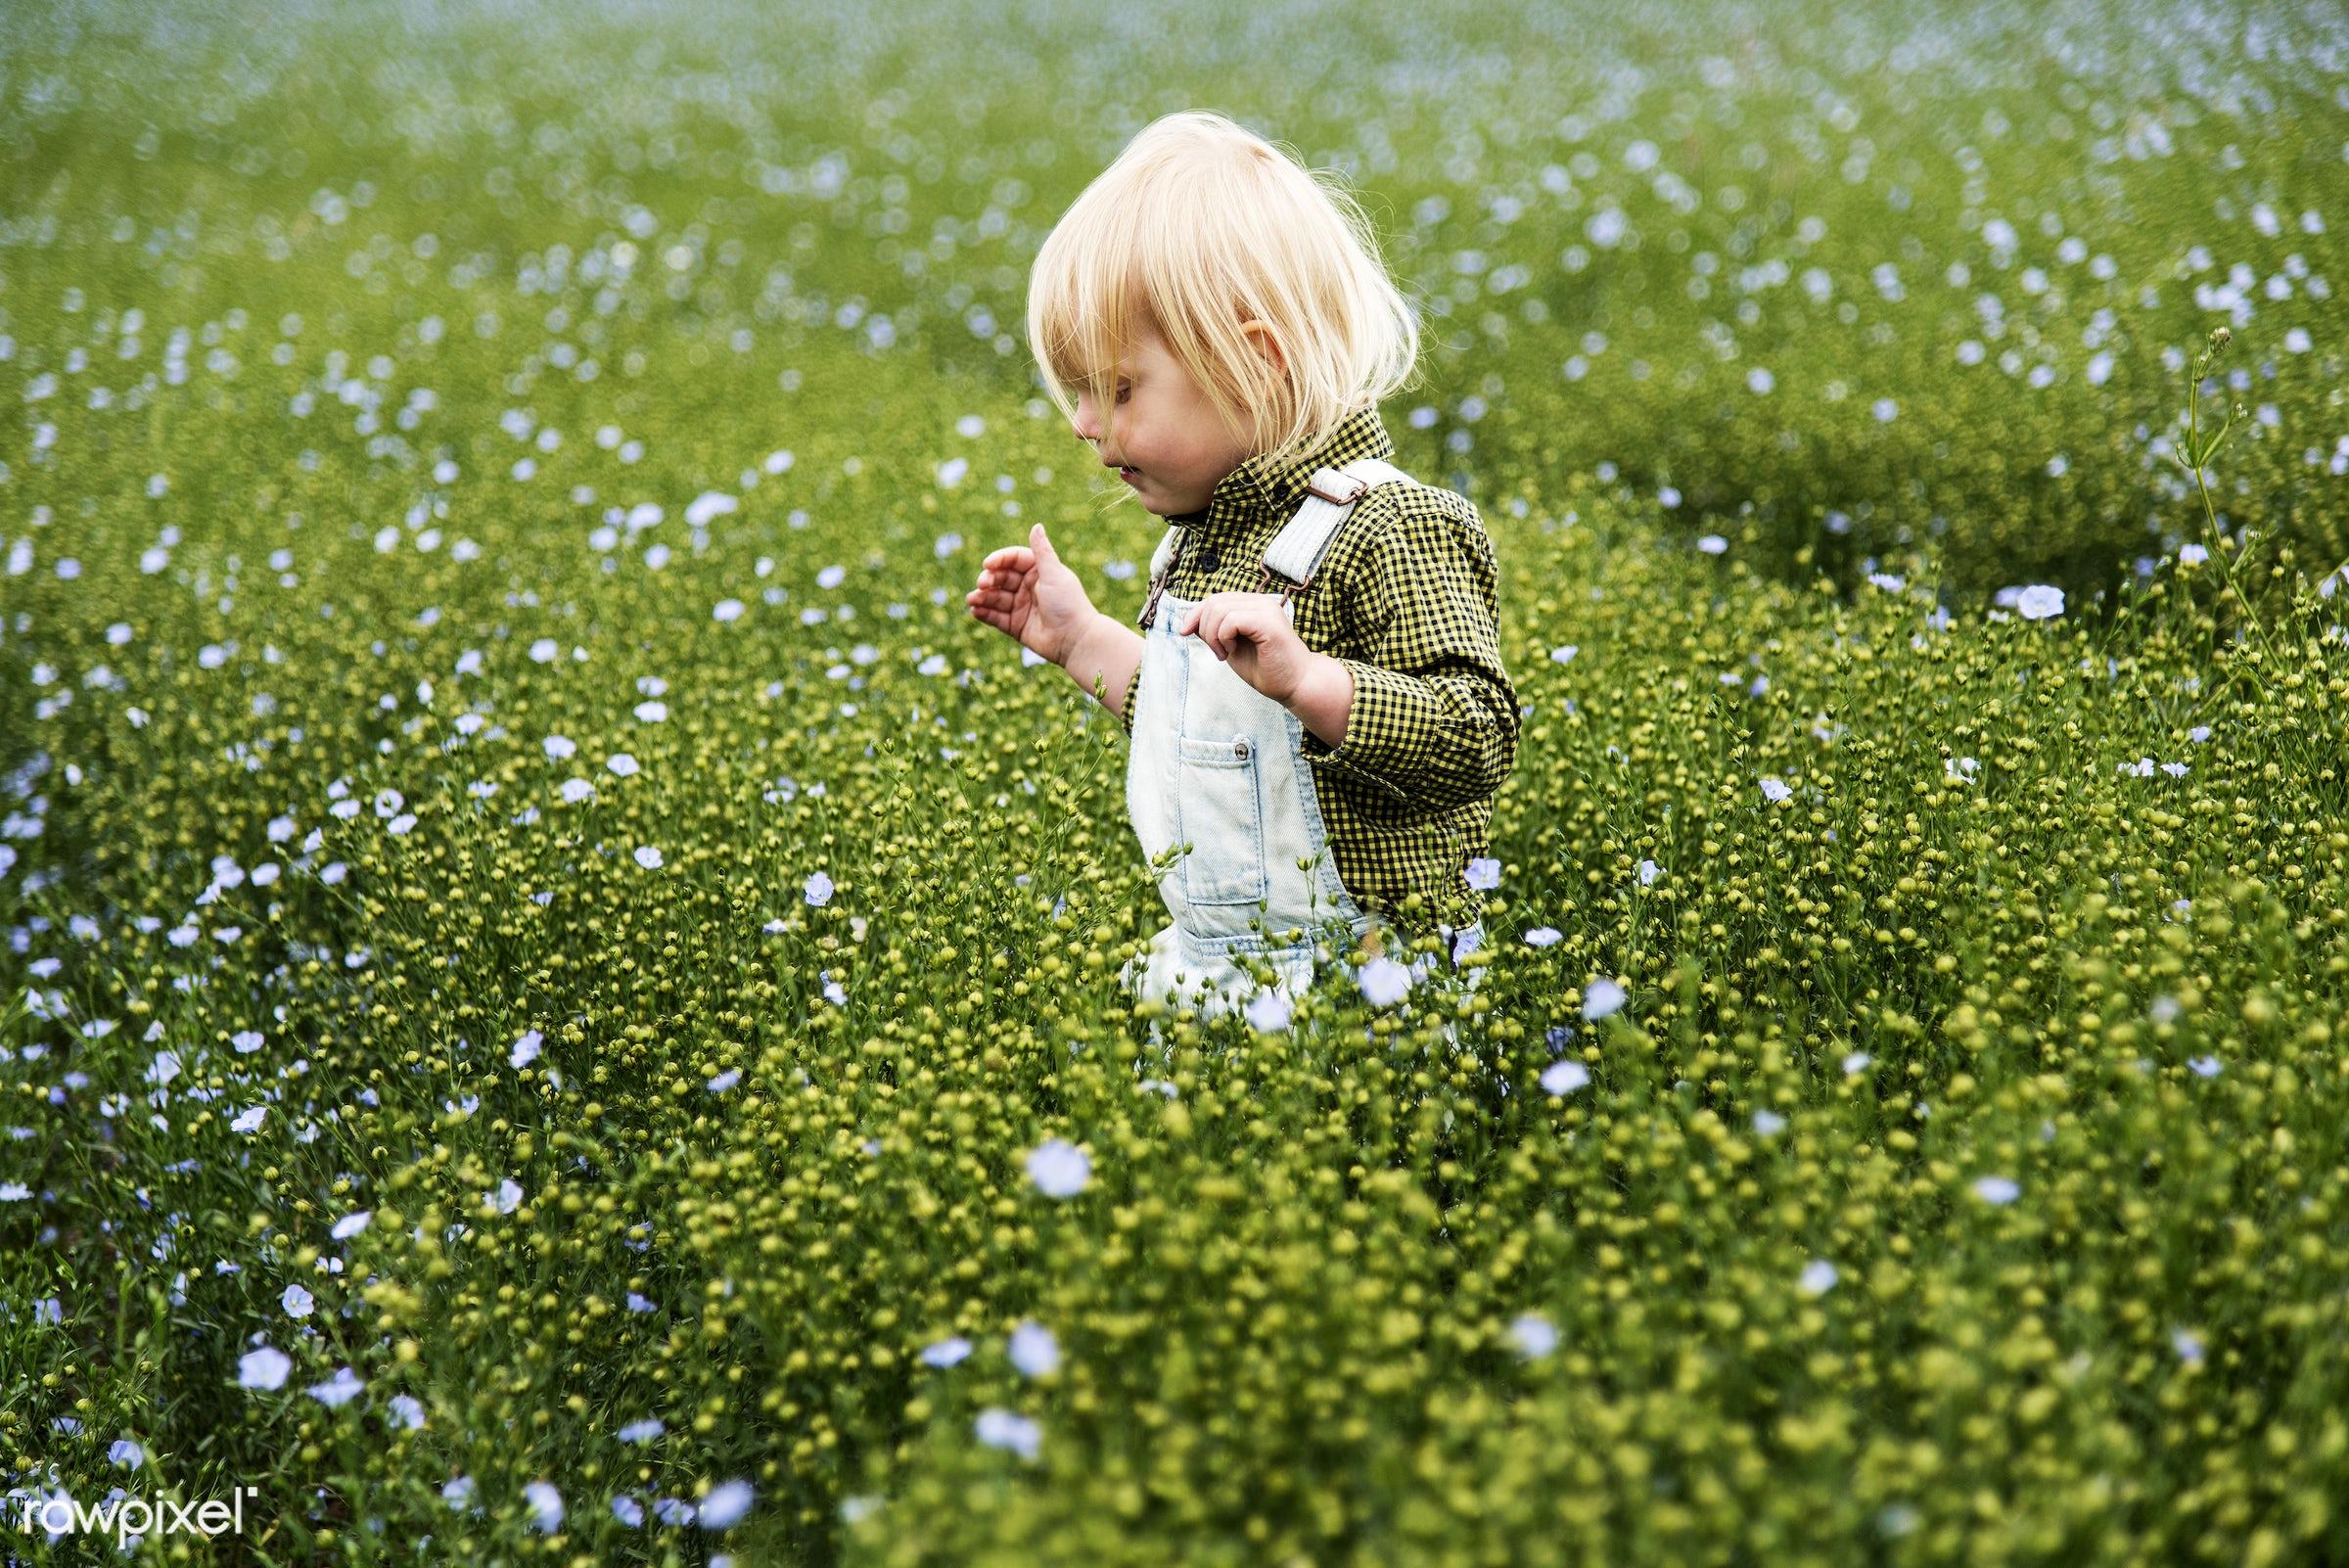 Kid in flower field - alone, backyard, bloom, blooming, blue, botanical, botany, boy, cheerful, child, children, countryside...